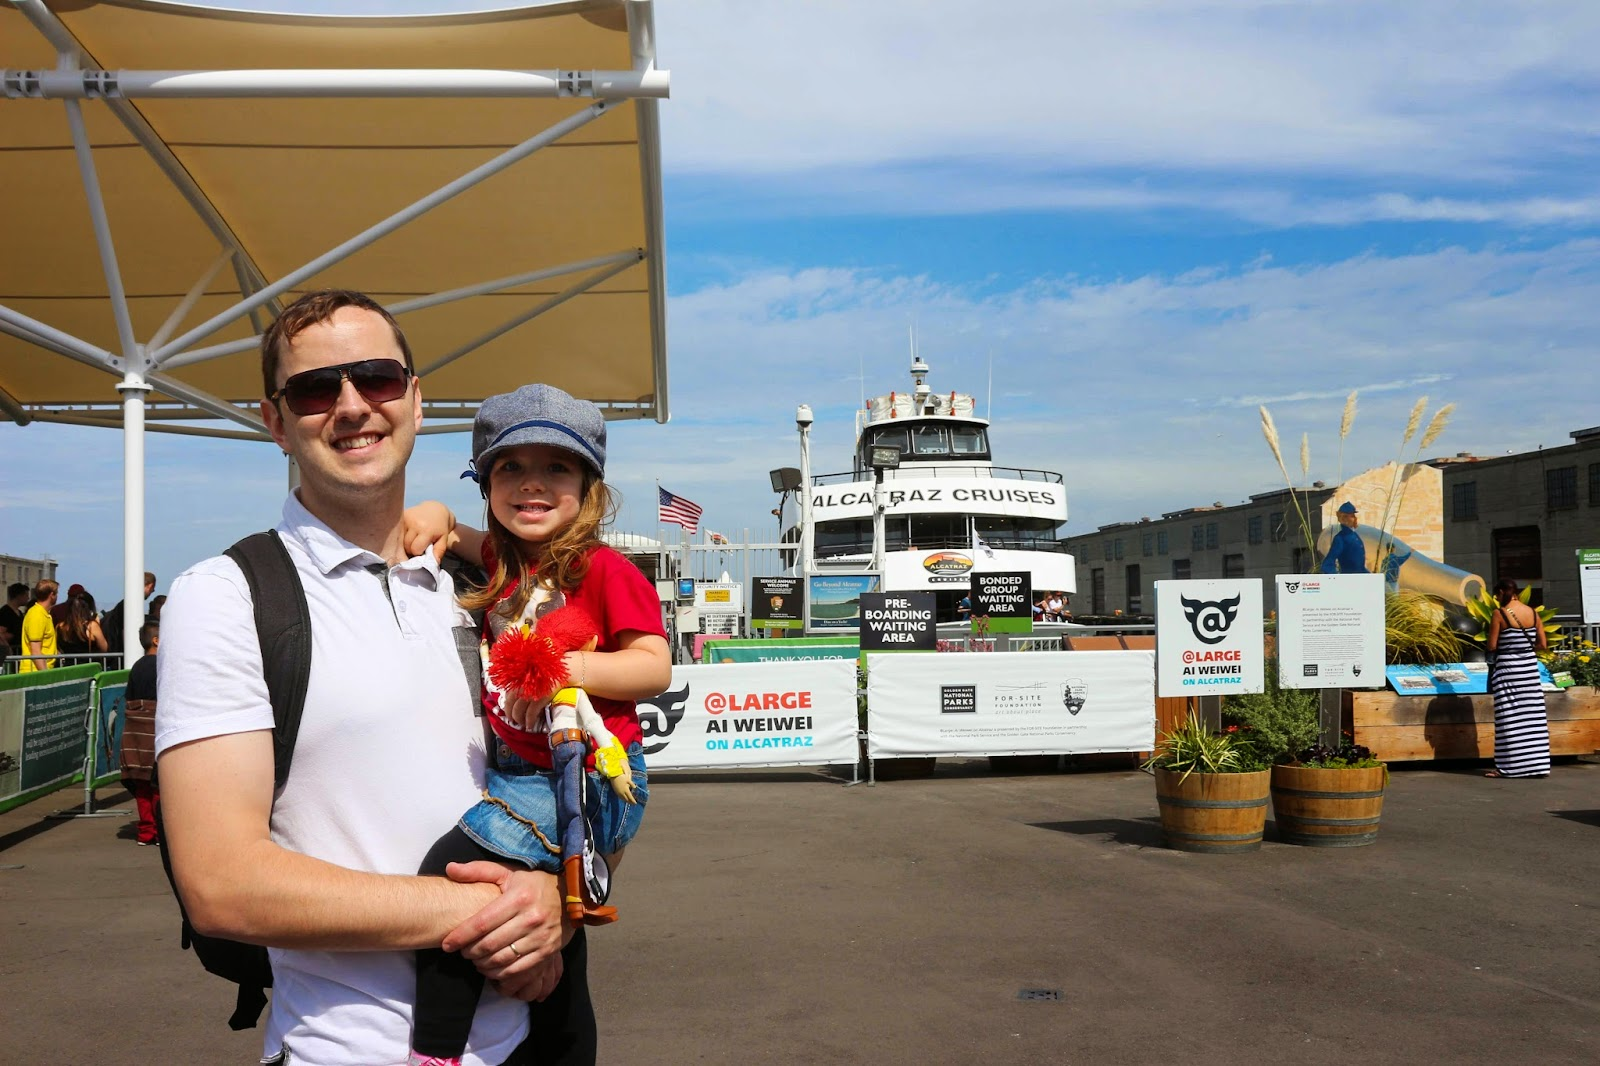 Tour Alcatraz - Pier 33